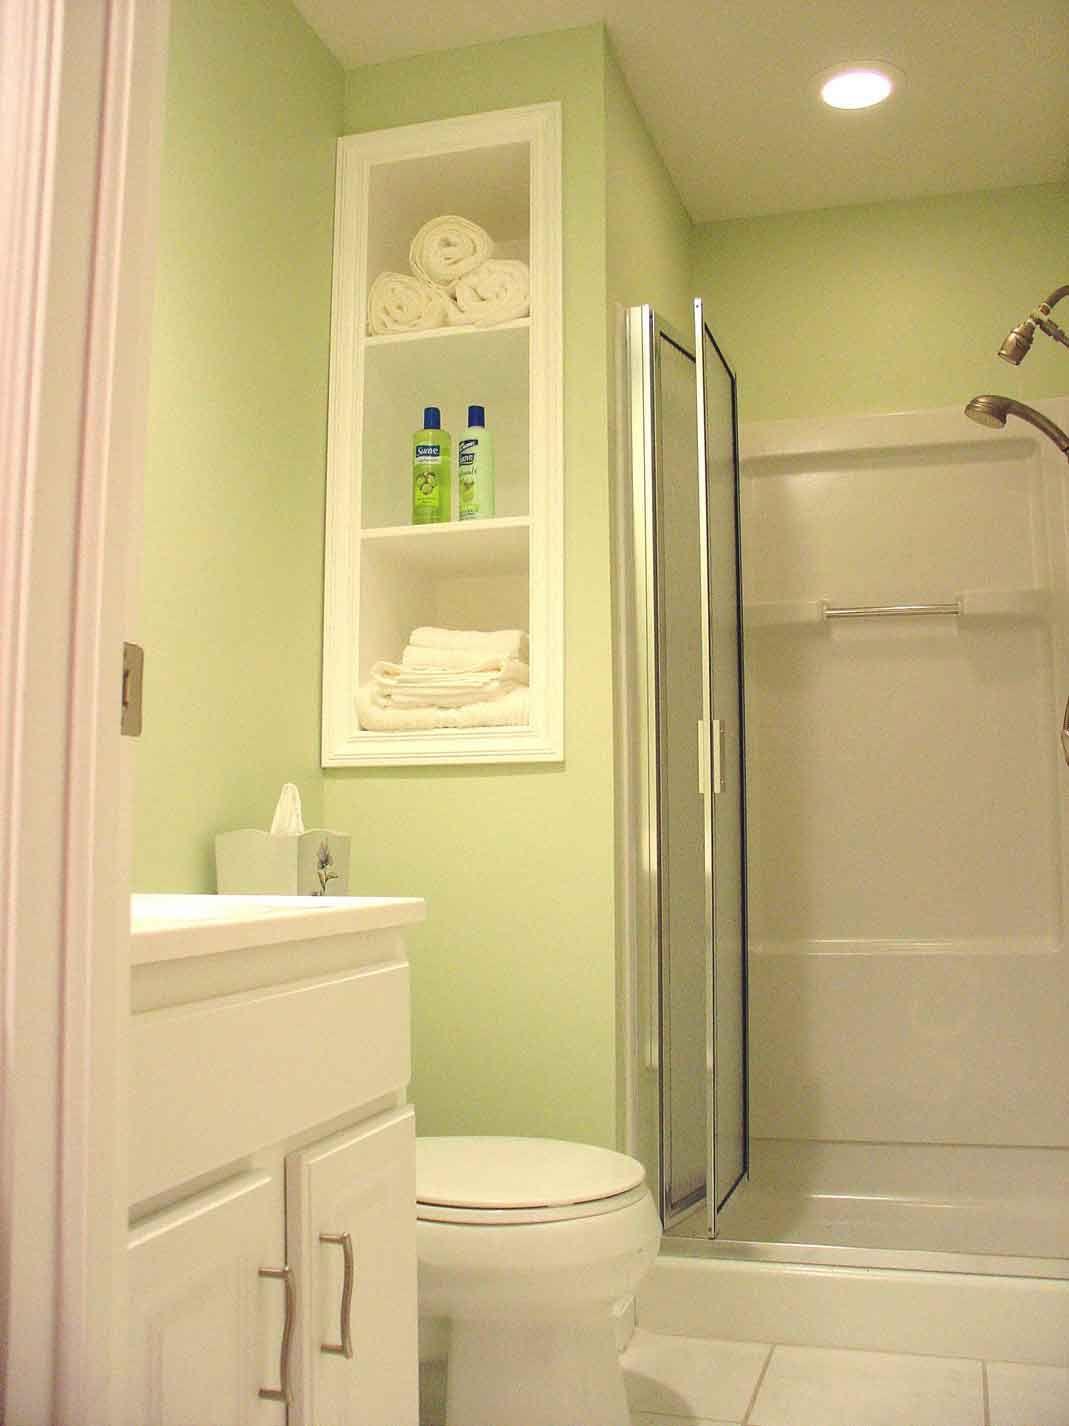 1000 images about bathroom ideas on pinterest beach bathrooms home depot and small bathrooms bathroom lighting ideas small bathrooms